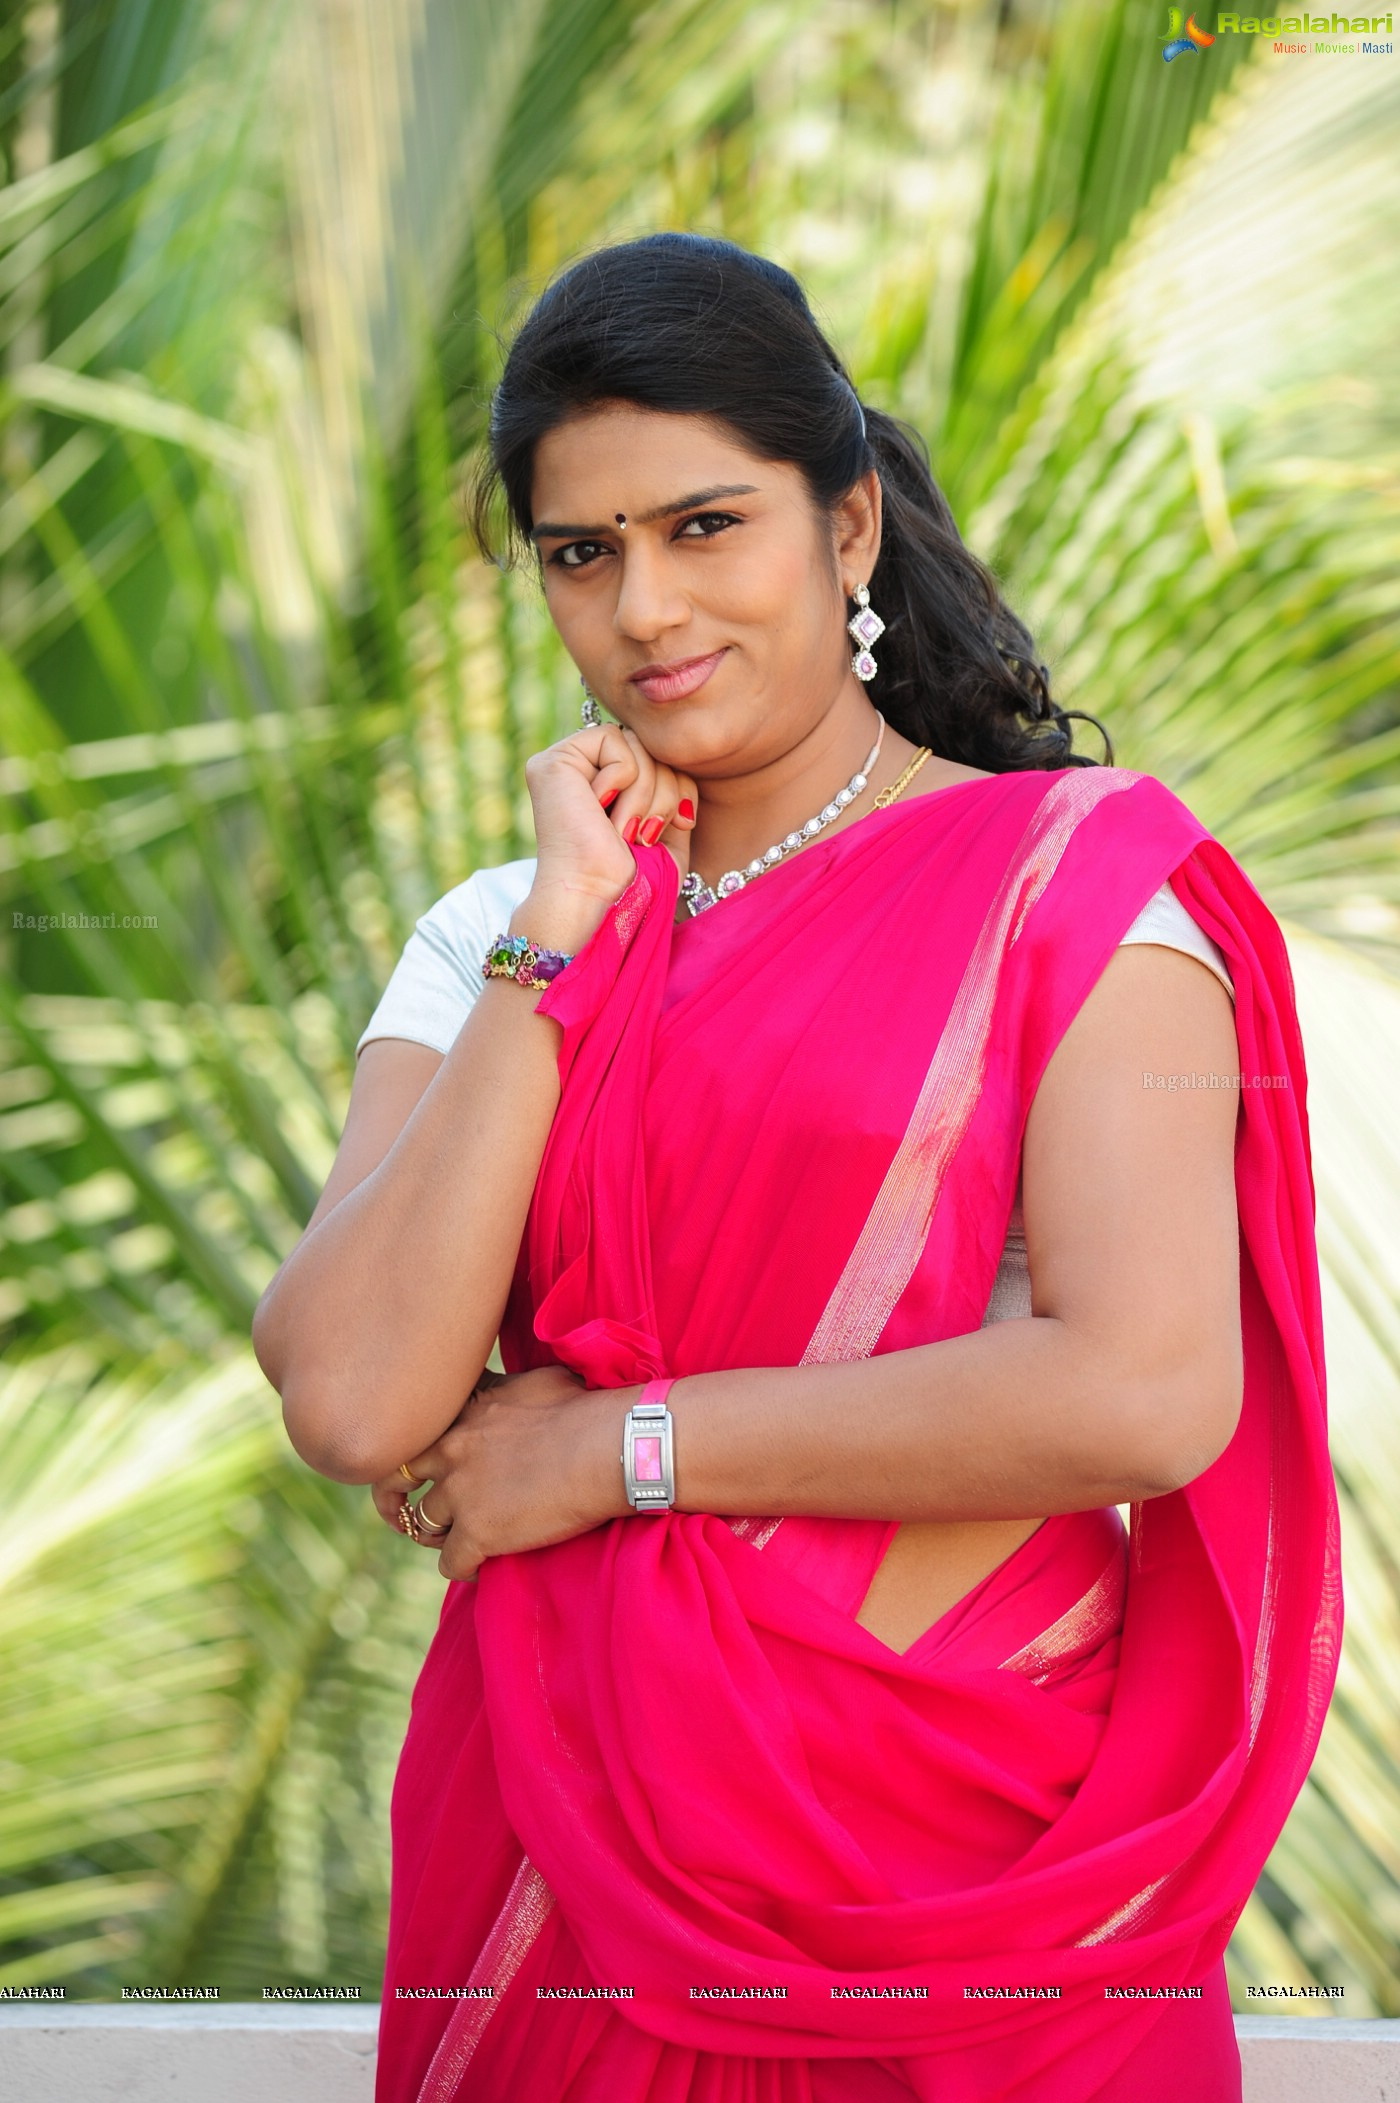 Bhavana posters image 21 telugu actress photo galleryimages bhavana posters altavistaventures Gallery